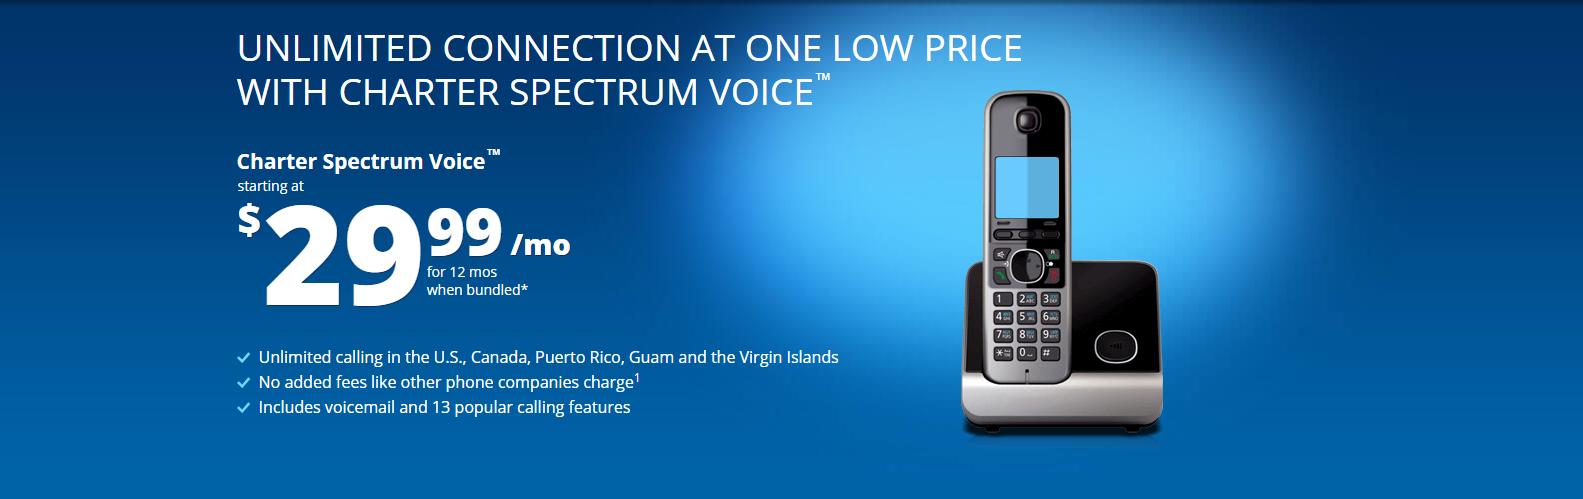 spectrum charter phone number